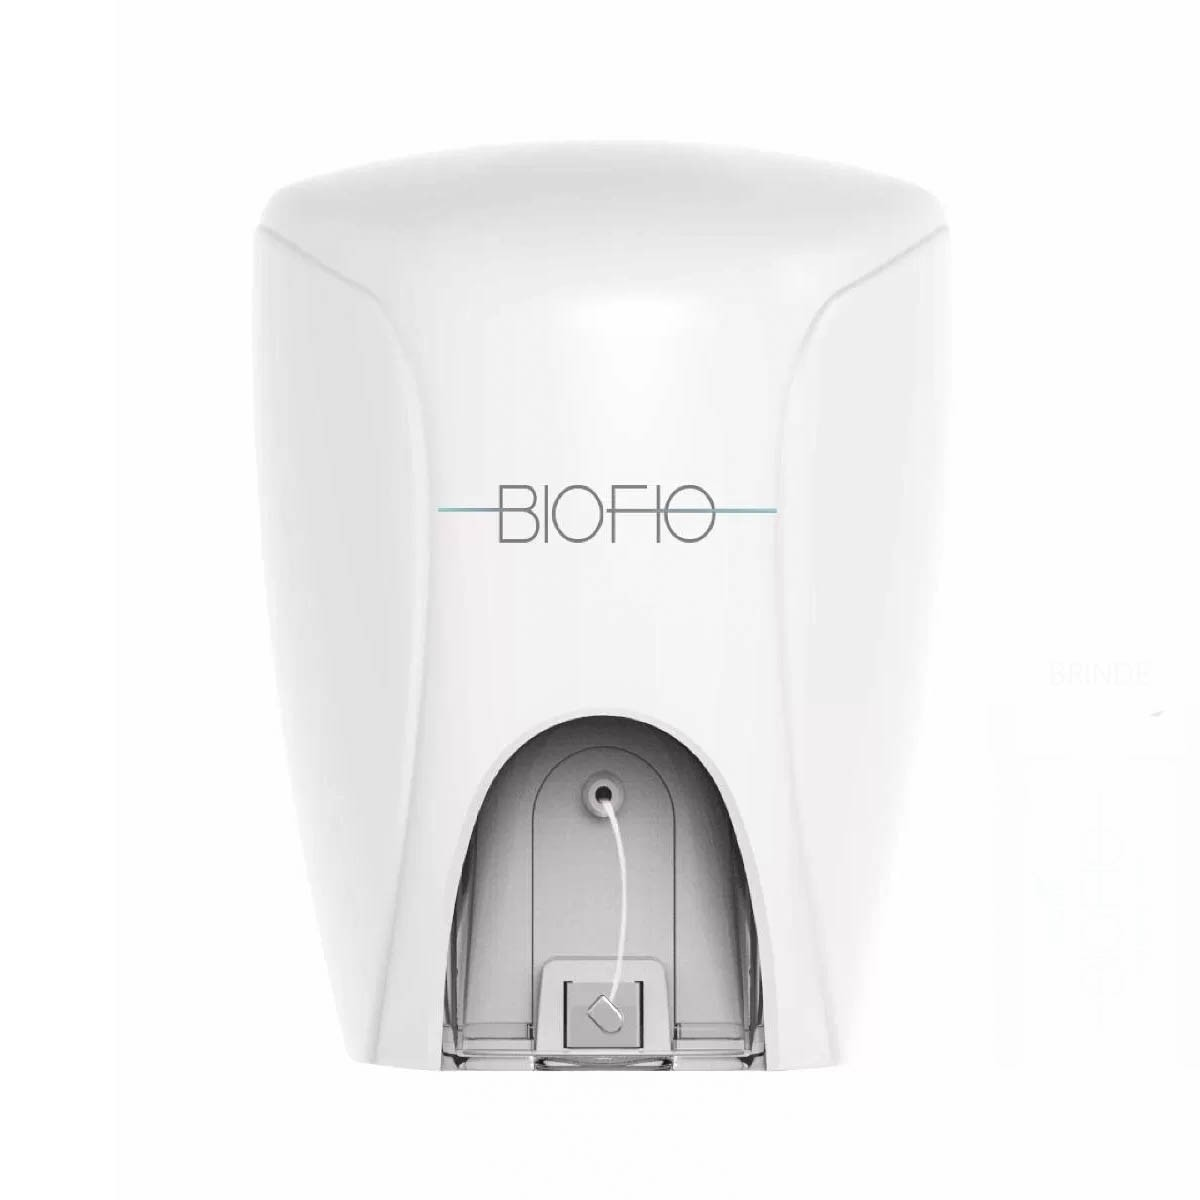 Porta Fio Dental De Parede Biofio - Biovis